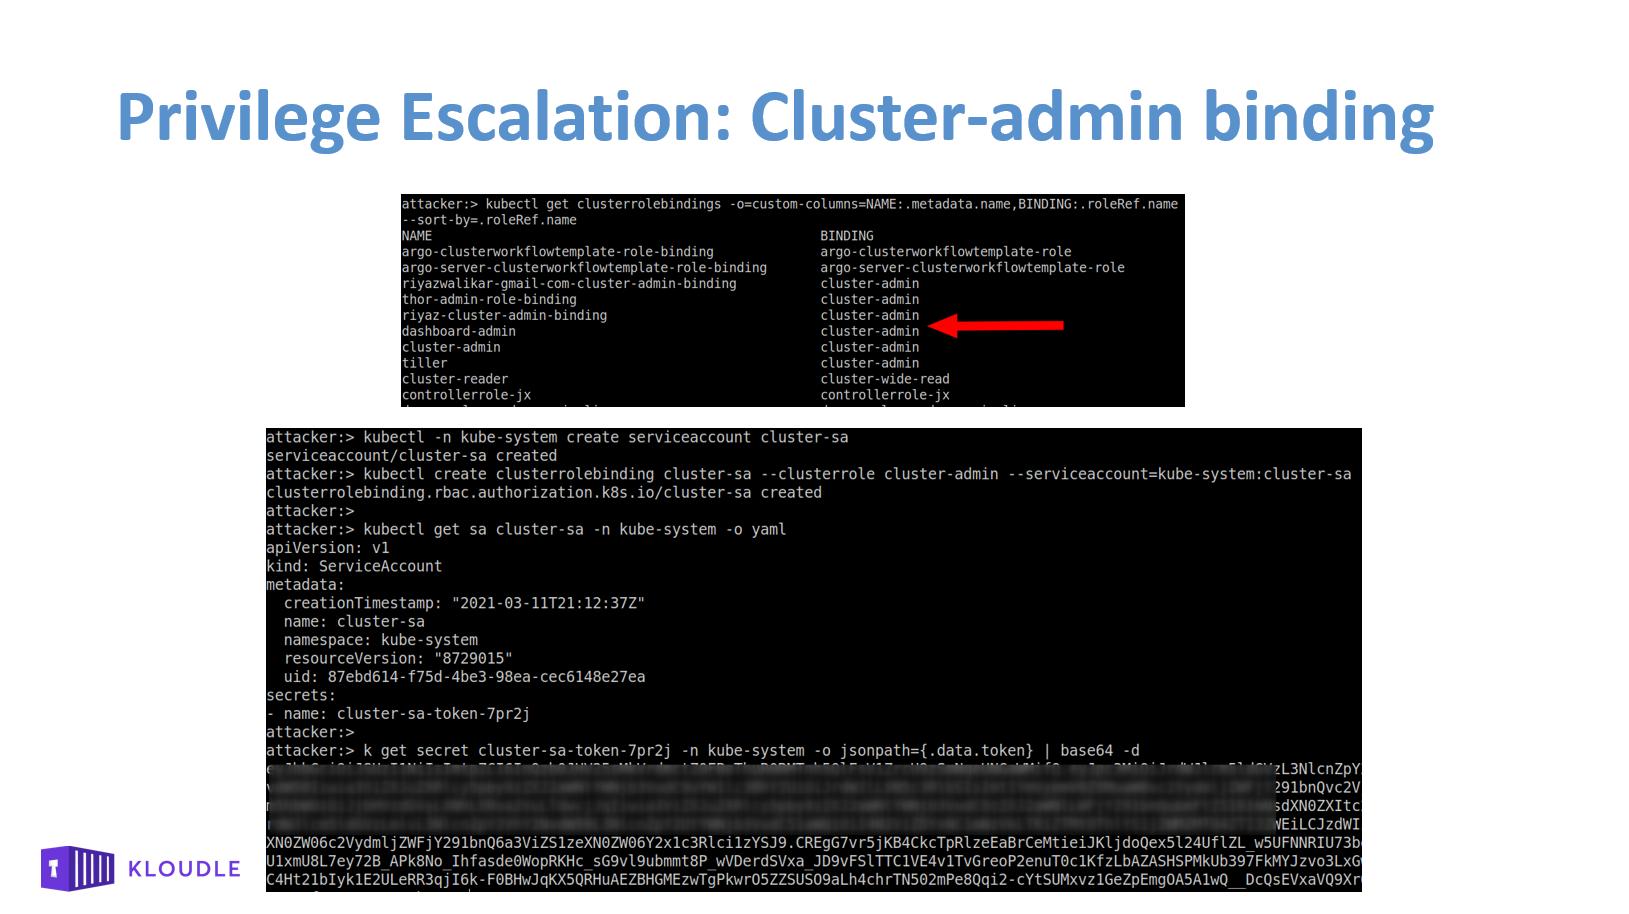 Privilege Escalation using cluster-admin binding